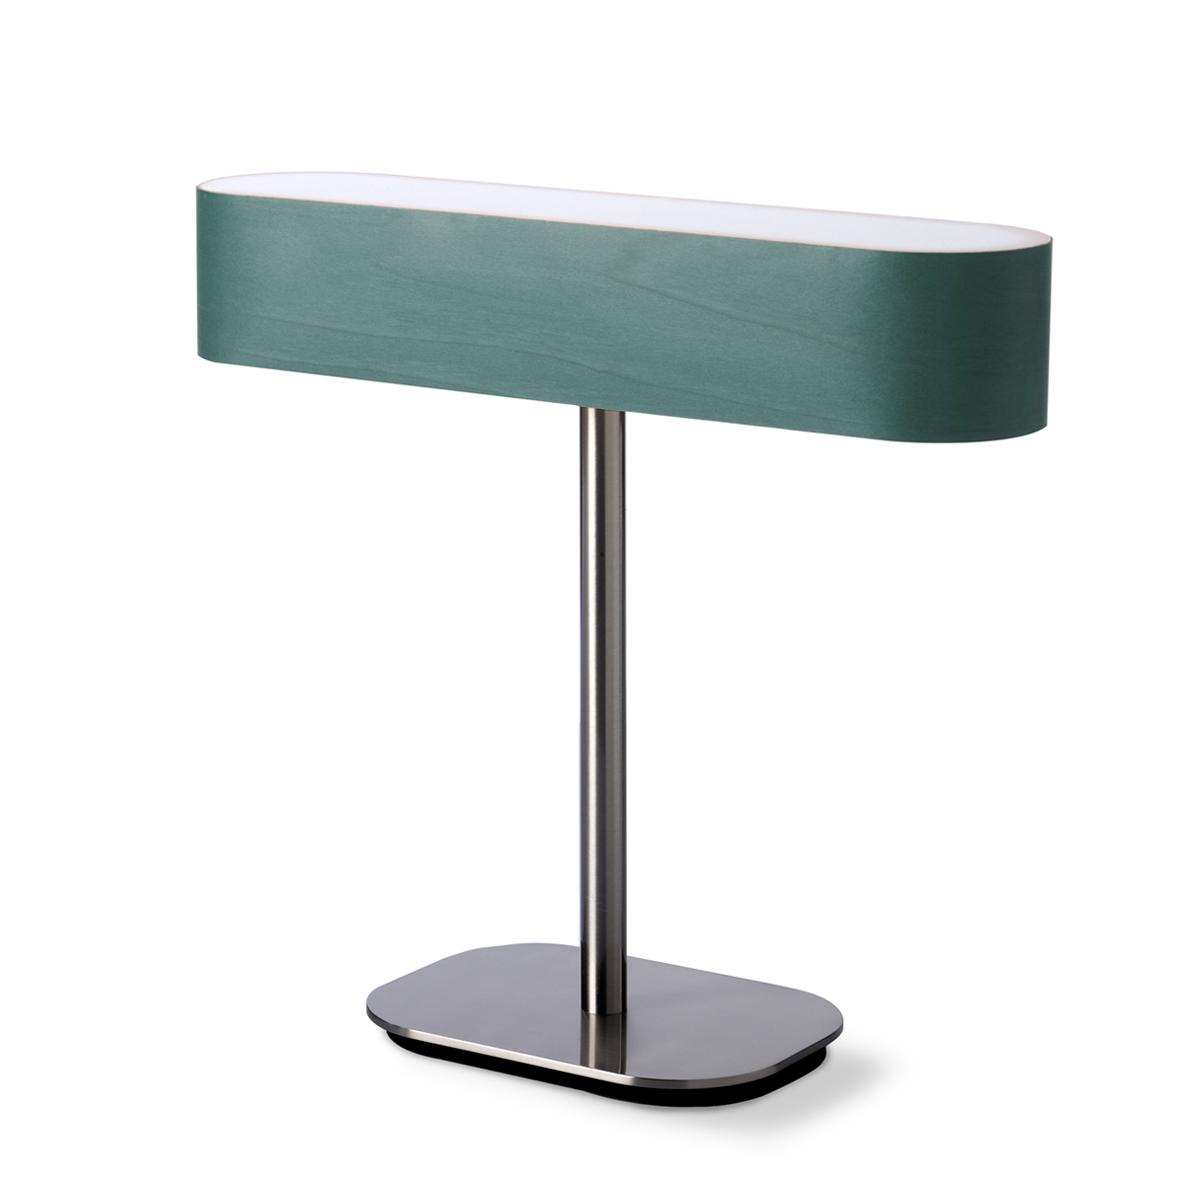 LZF Lamps I-Club LED Tischleuchte I M LED DIM 30